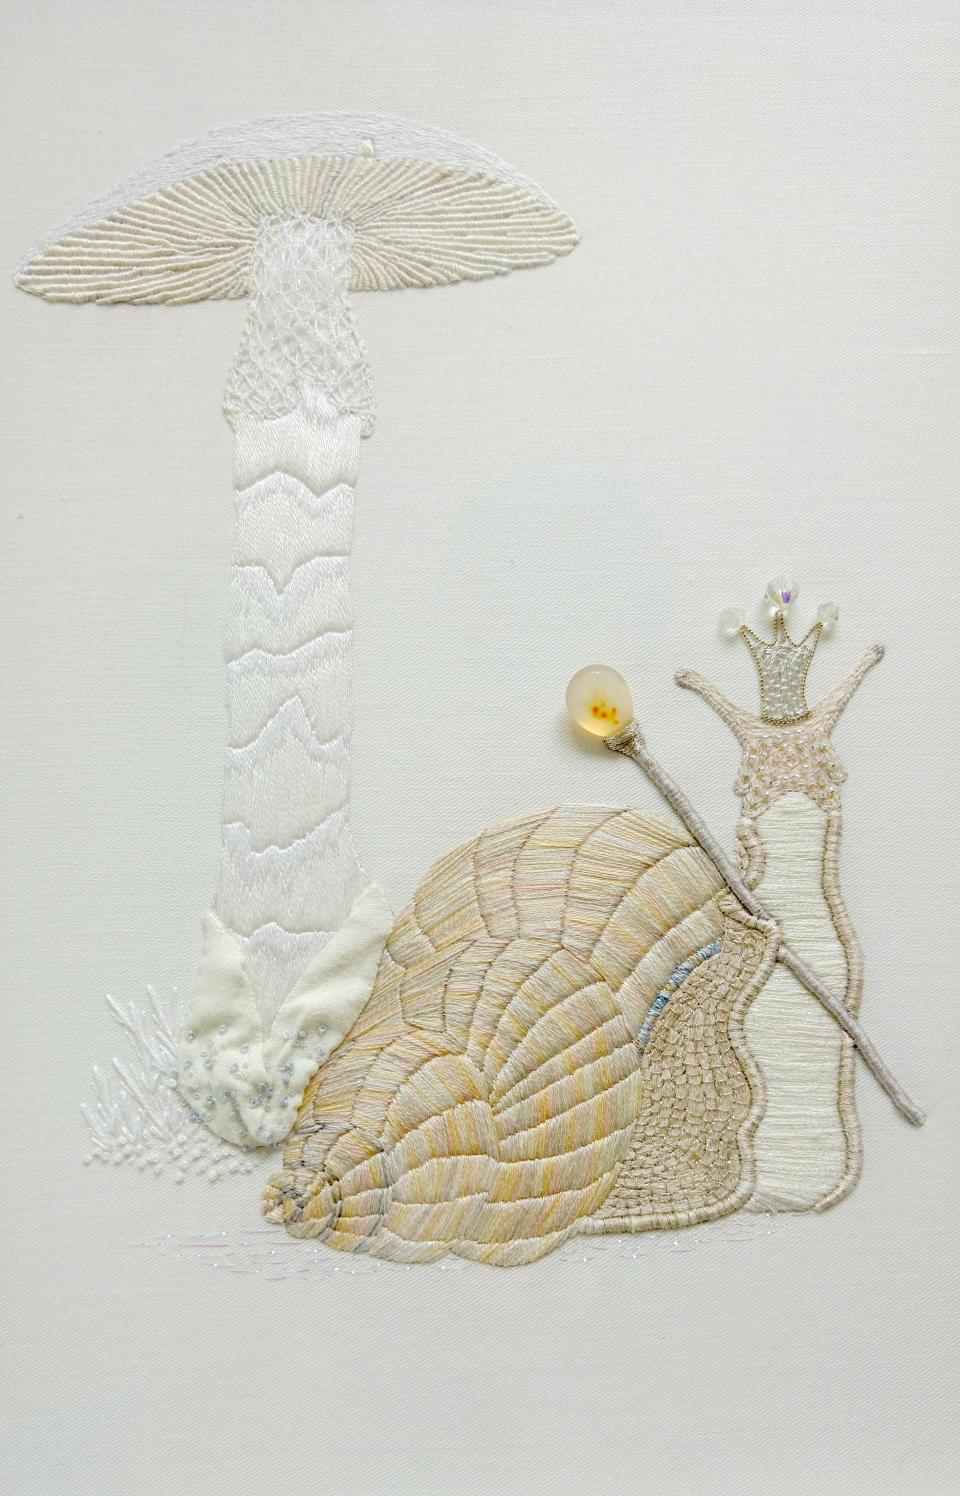 snailcomplete2